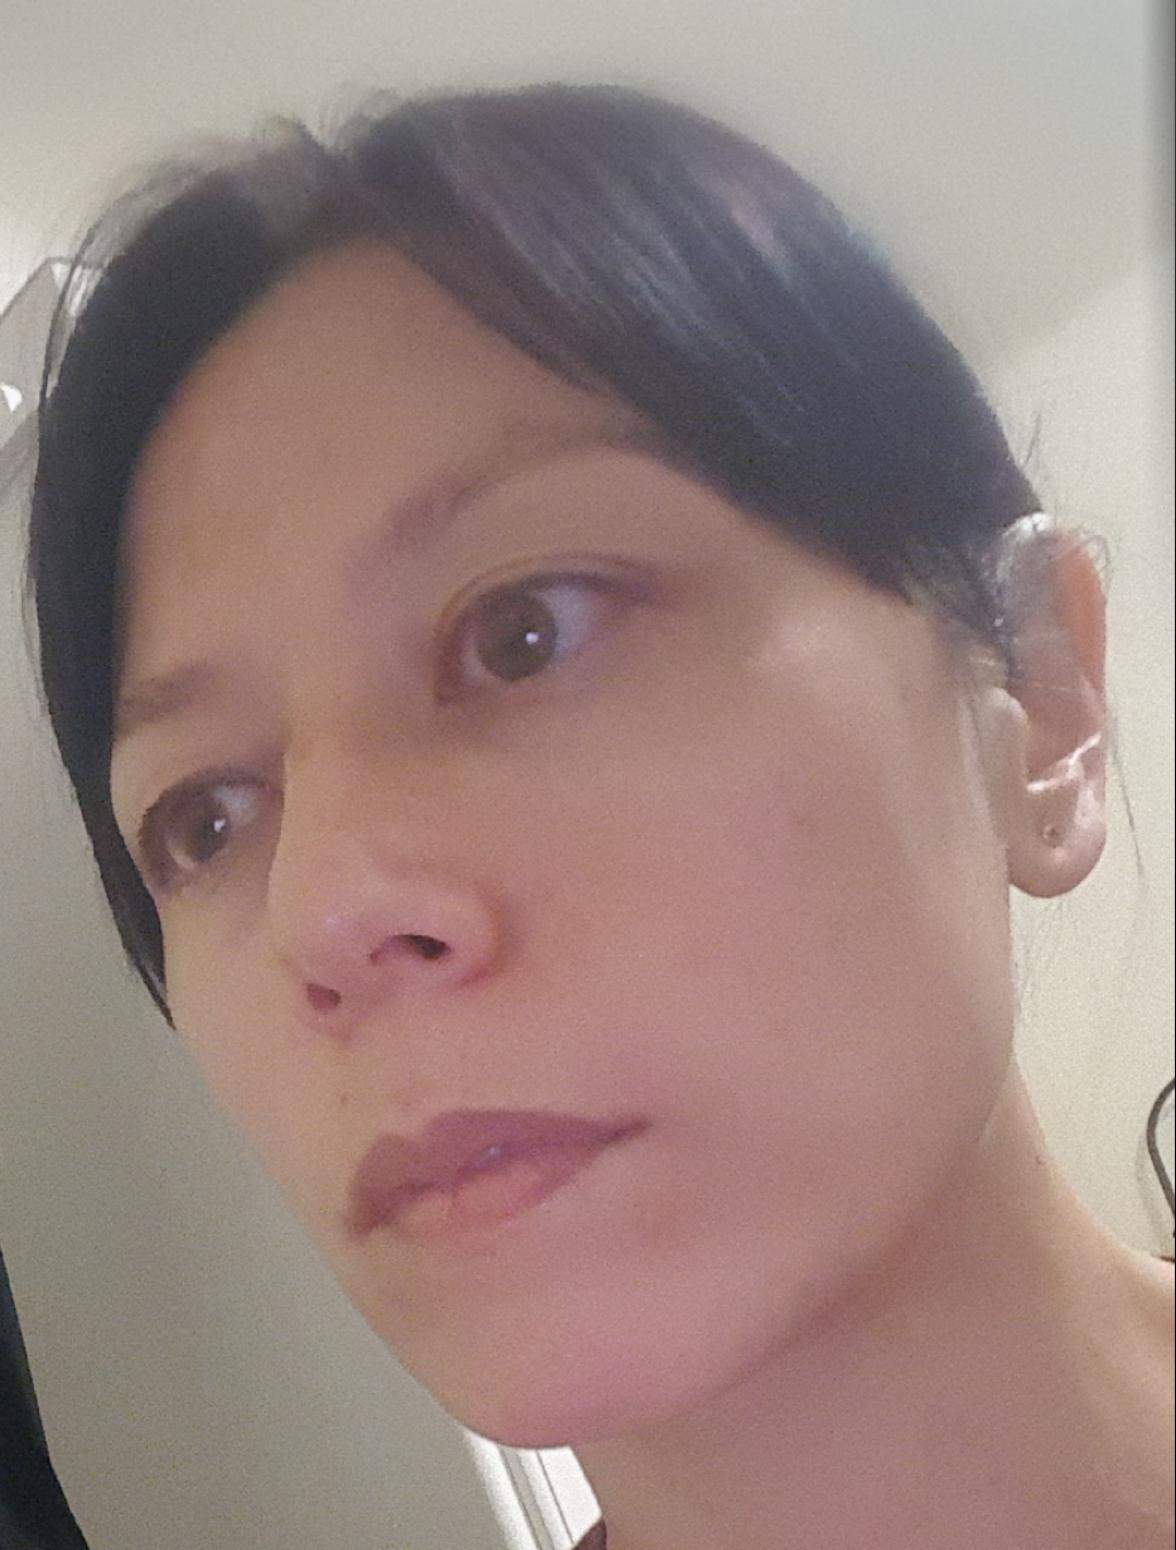 Erica Weems